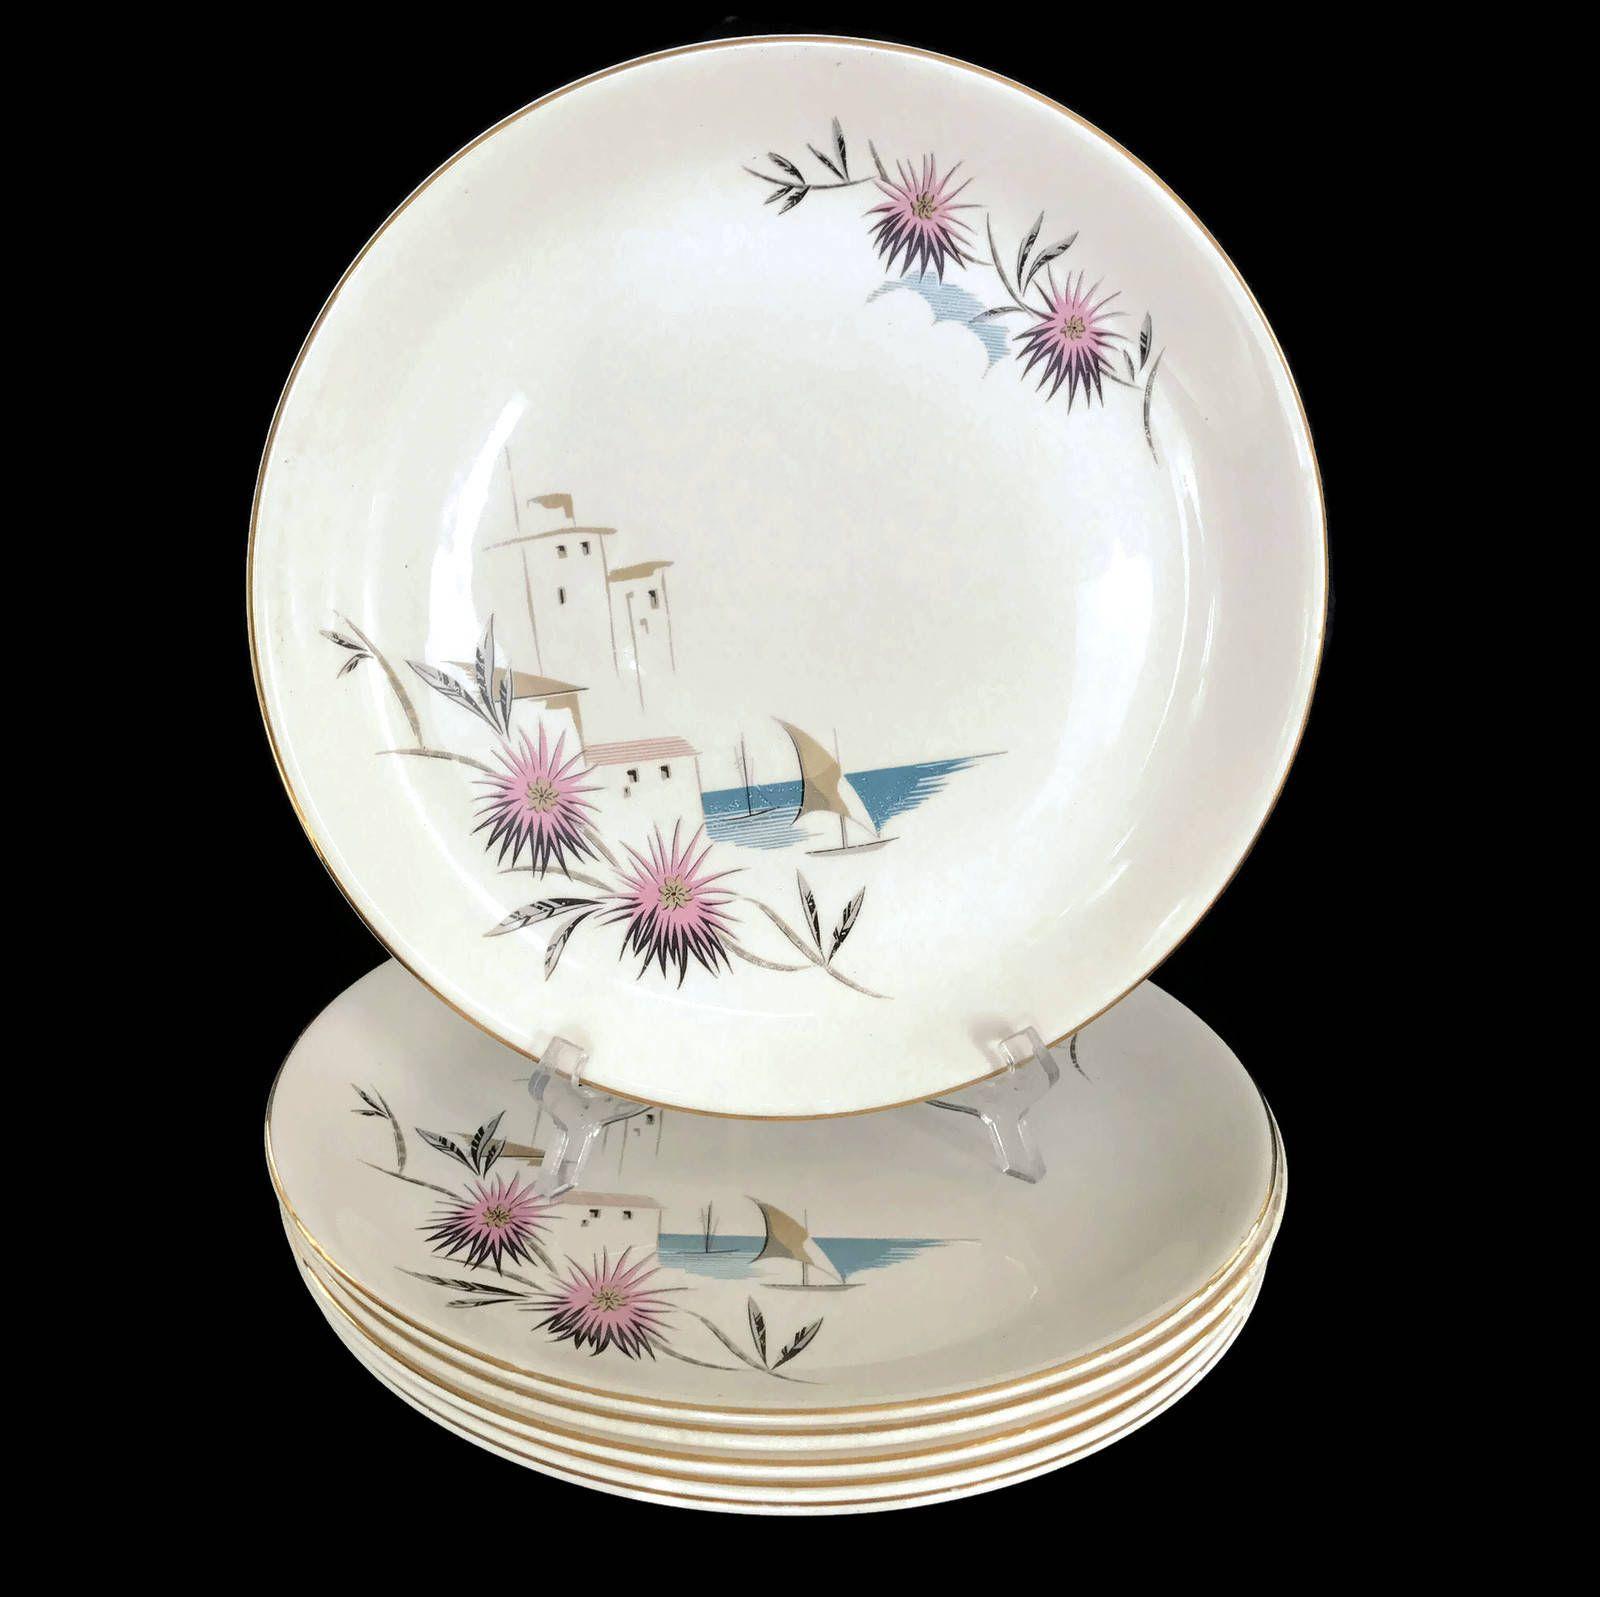 1950s Swinnertons Nestor Vellum Dinner Plates Mid Century Dinnerware Staffordshire Made in England Retro Plates Sailboat  sc 1 st  Pinterest & 1950s Swinnertons Nestor Vellum Dinner Plates Mid Century ...